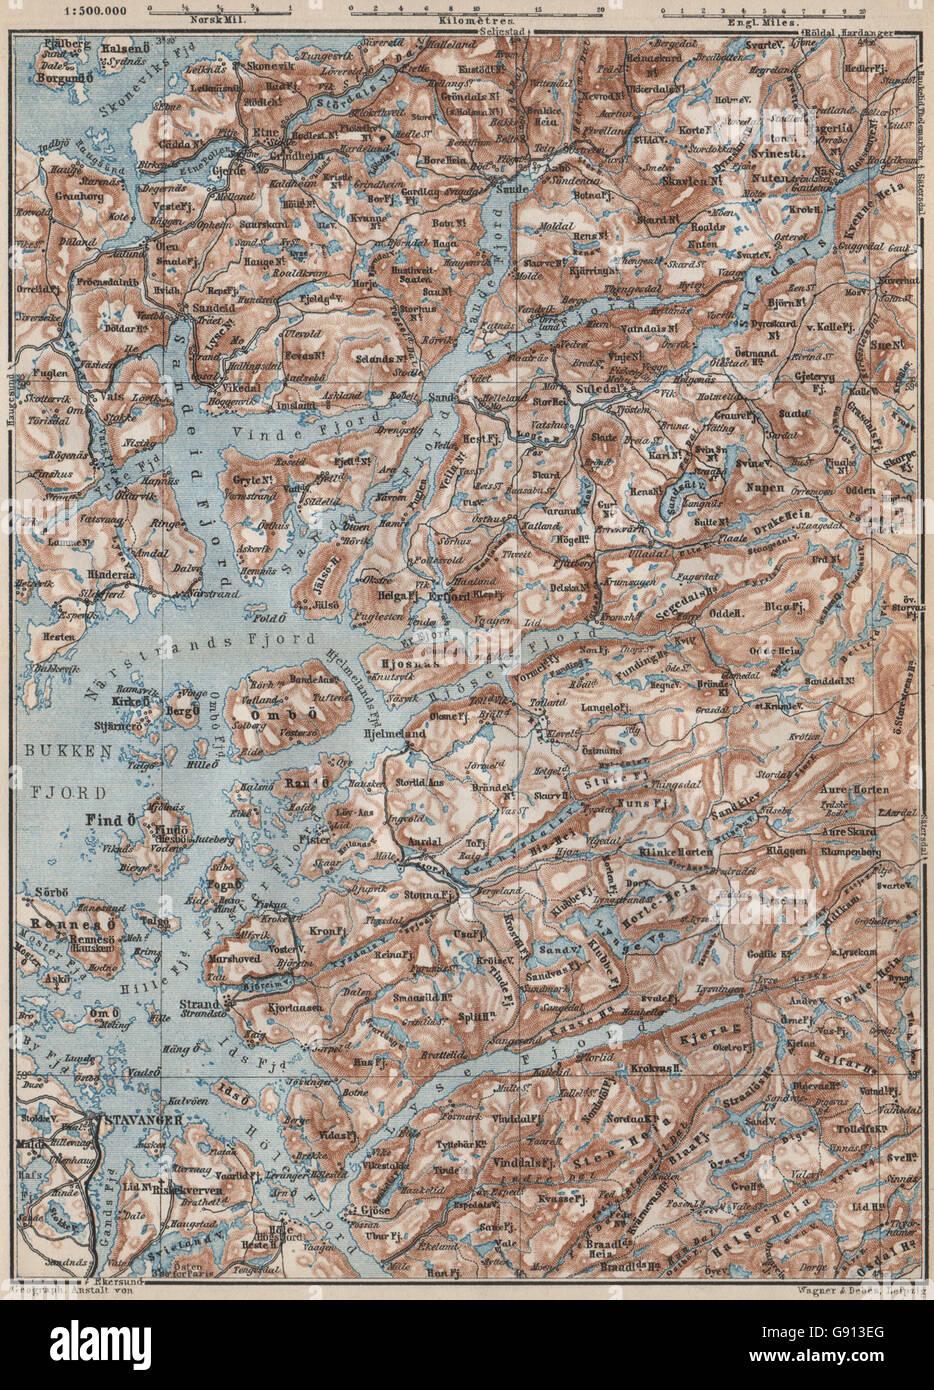 Karta Norge Stavanger.19th Century Norway Map Stock Photos 19th Century Norway Map Stock